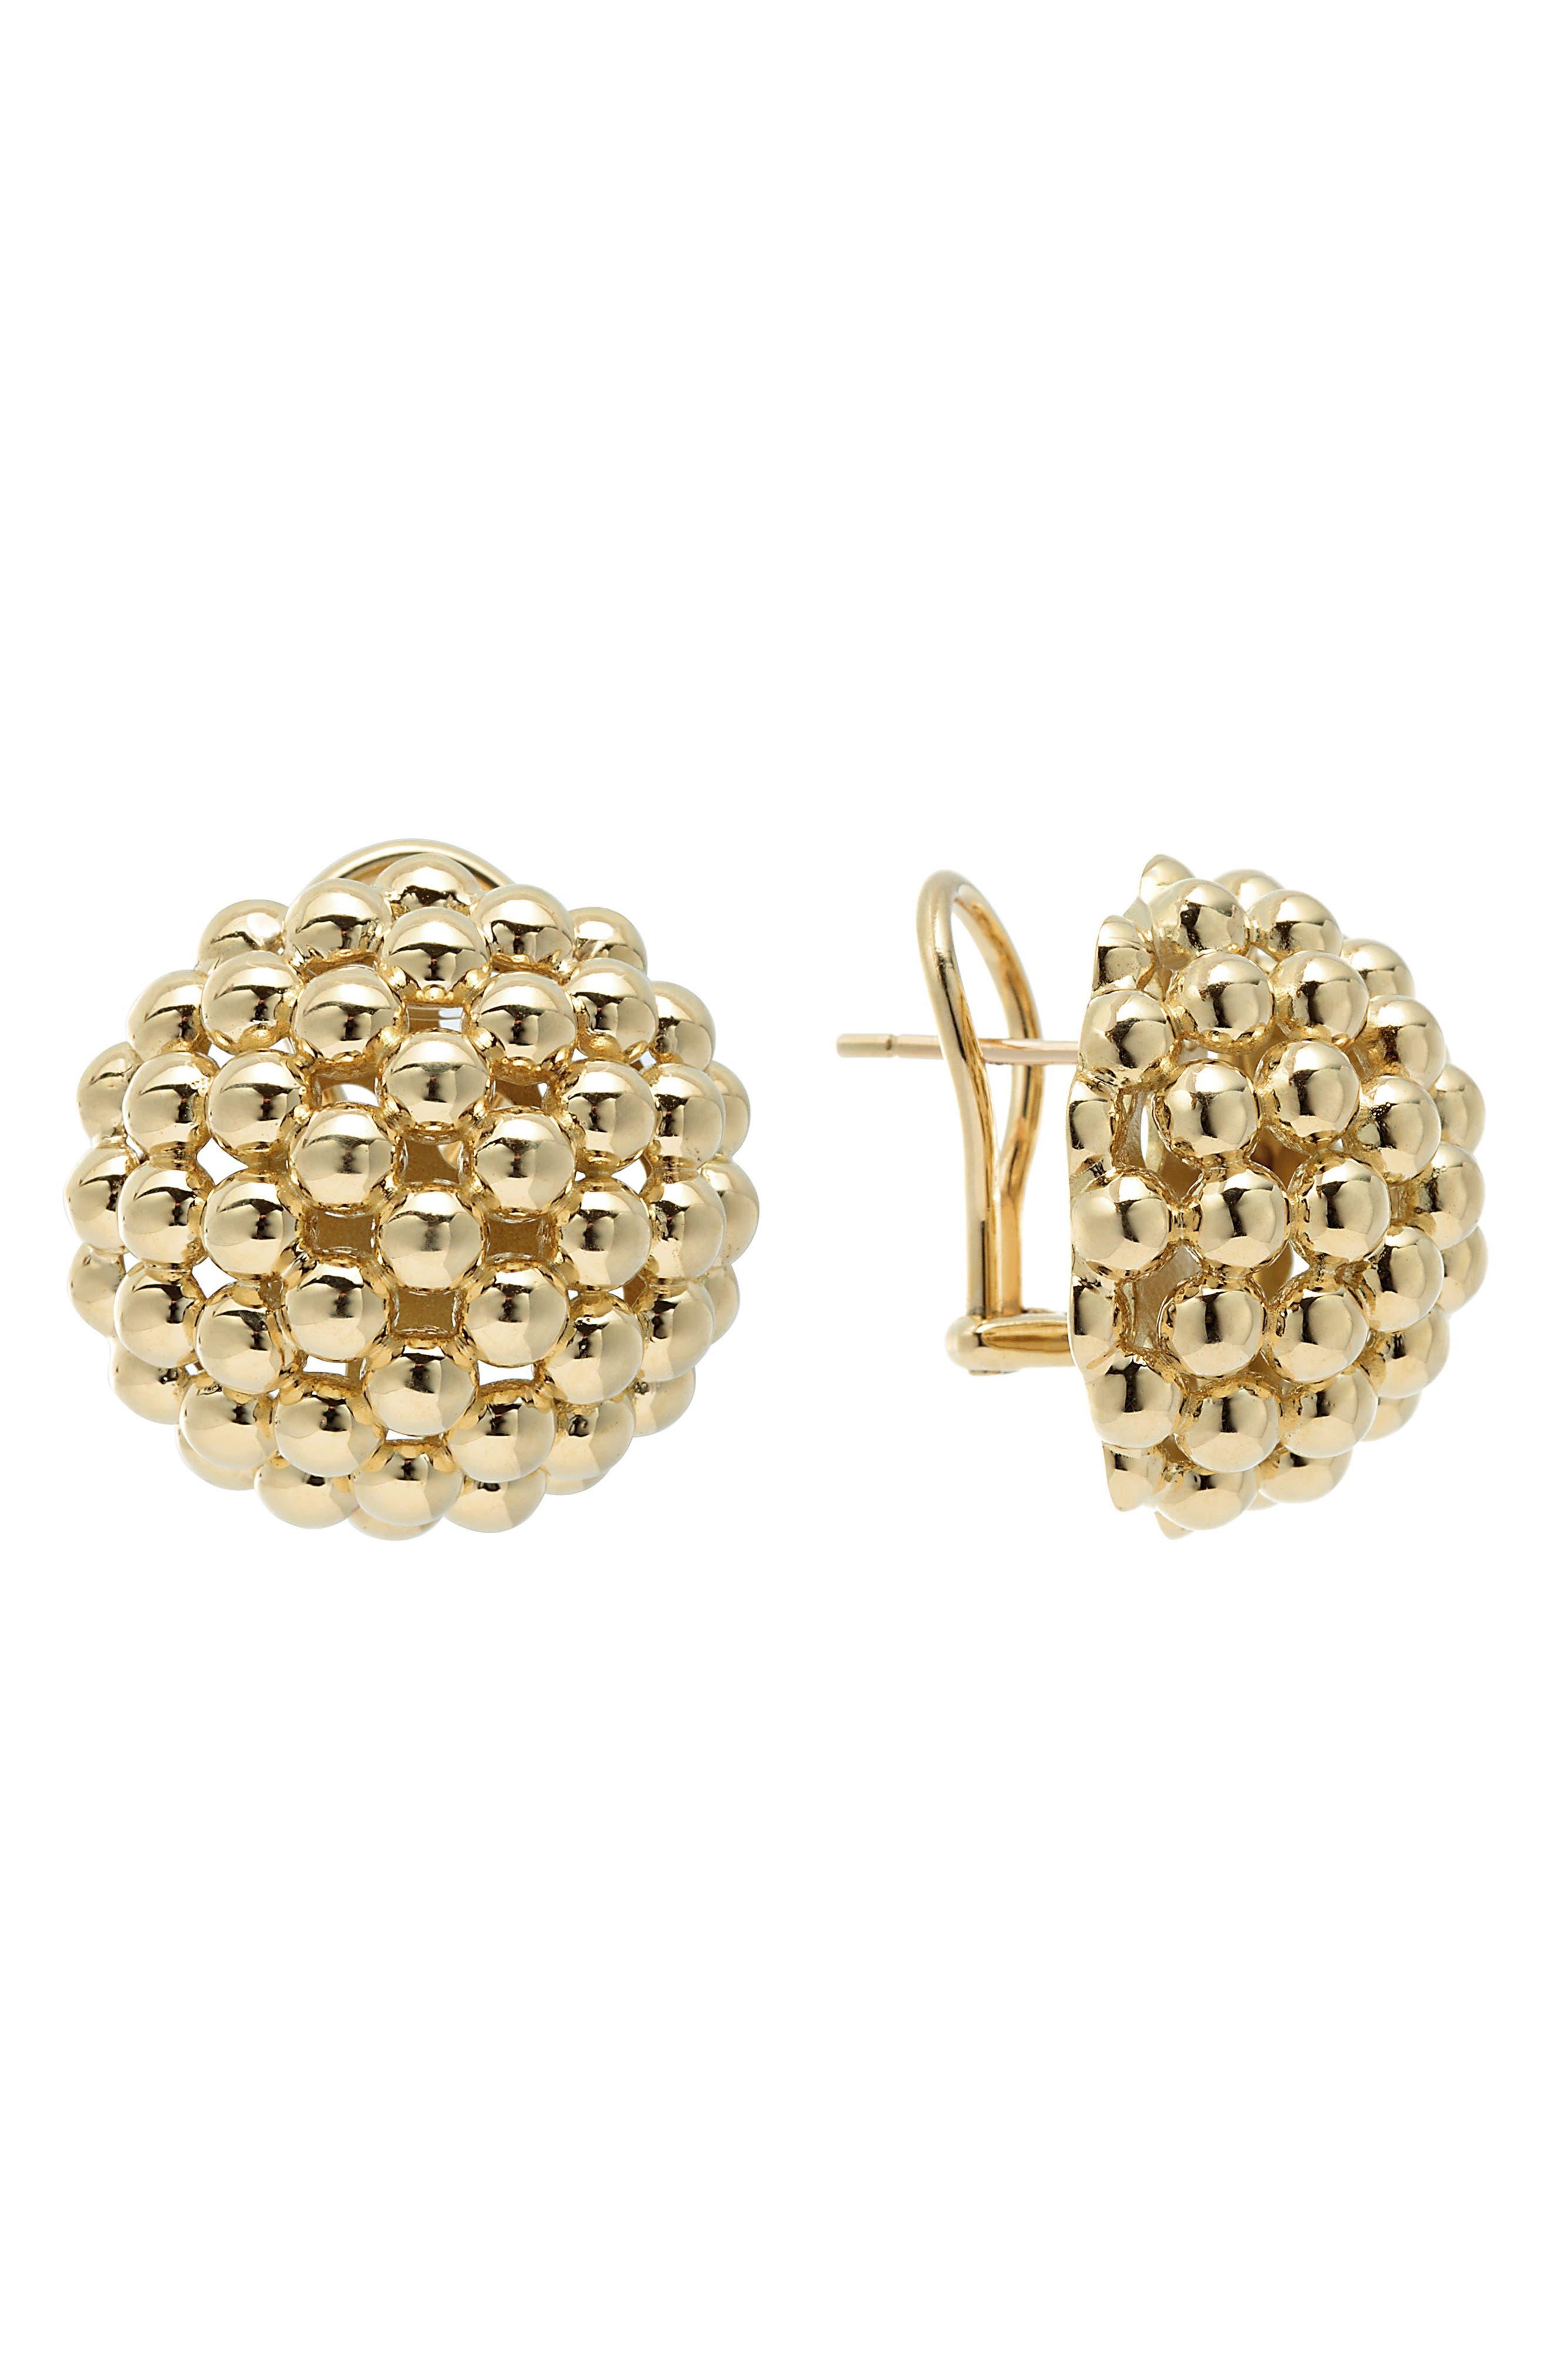 Caviar Gold Dome Omega Earrings,                         Main,                         color, Gold